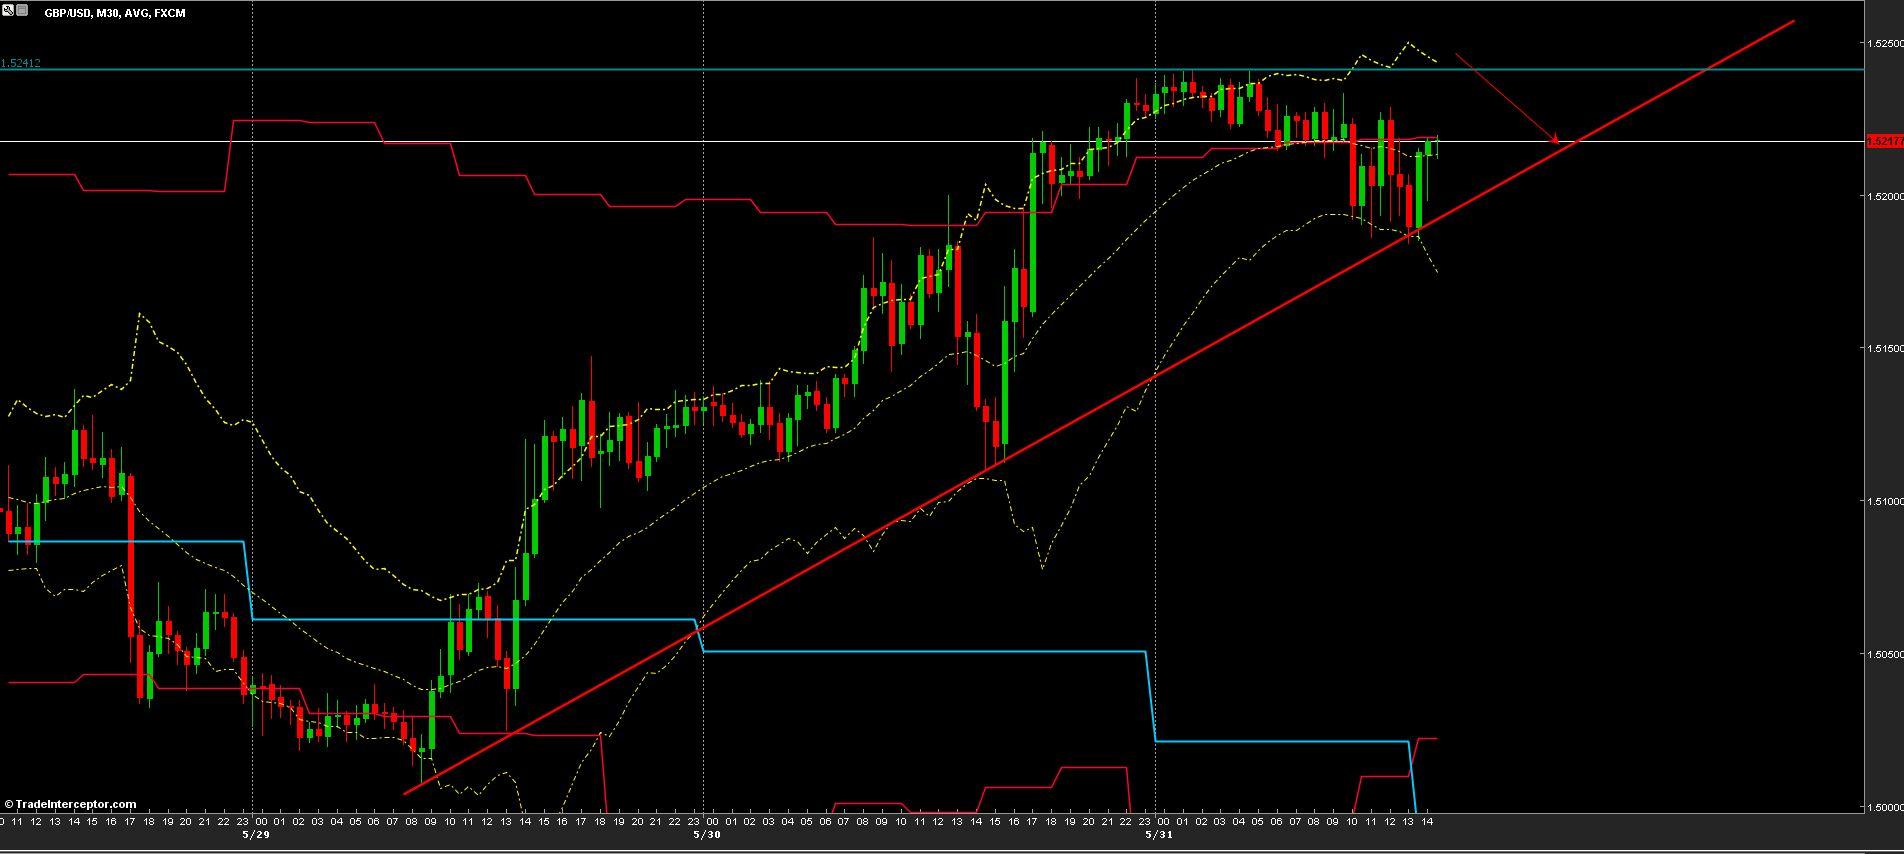 GBP/USD Chart 31/05/2013